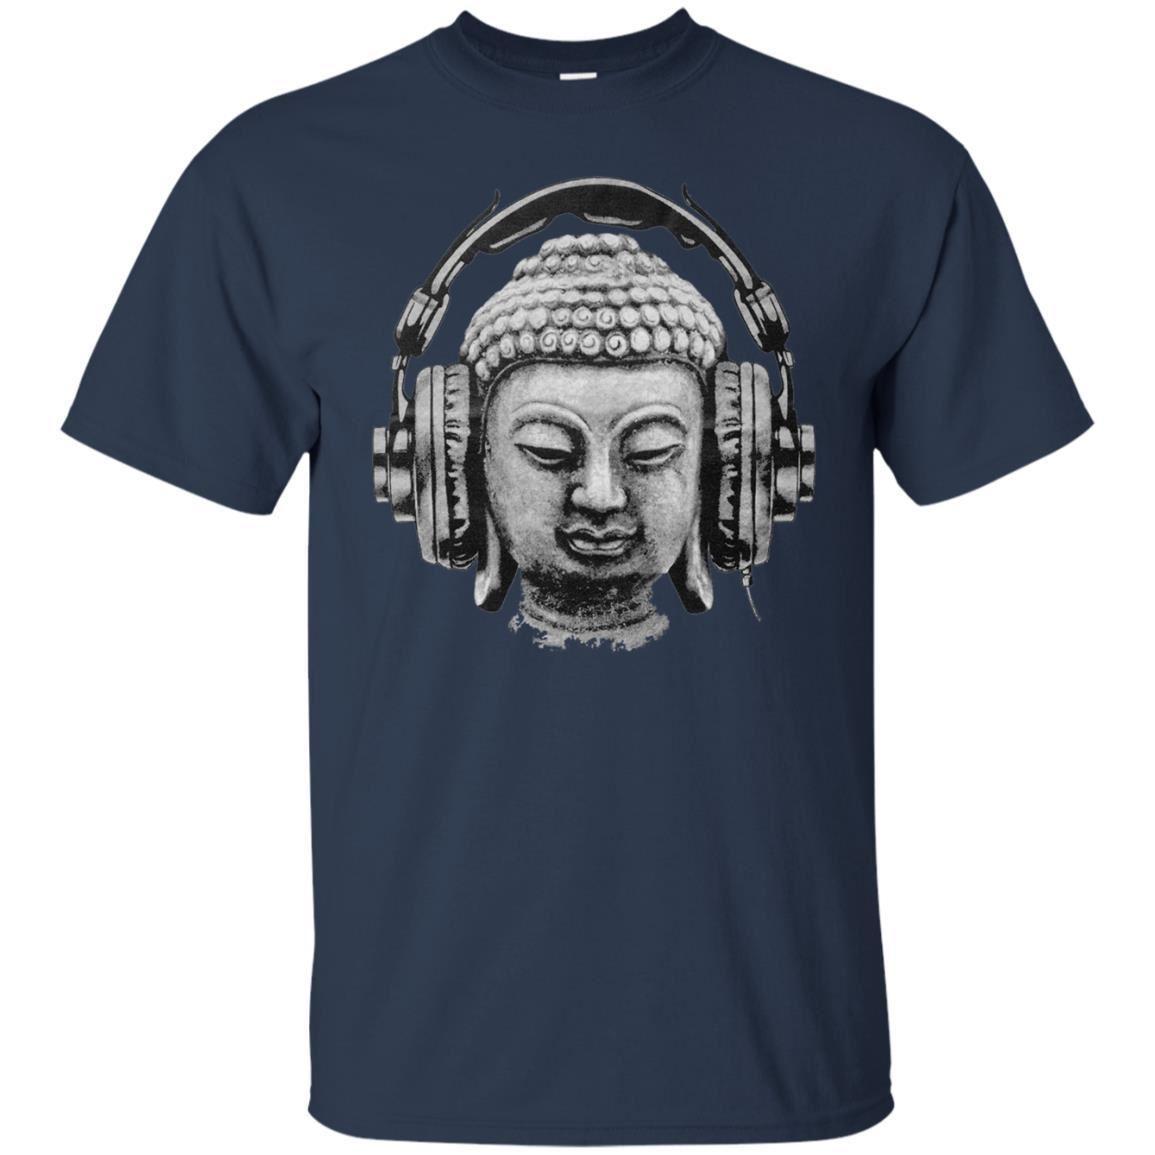 Buddha Banksy Headphones Quirky Street Art Graffiti Mens T Shirt Tee Top